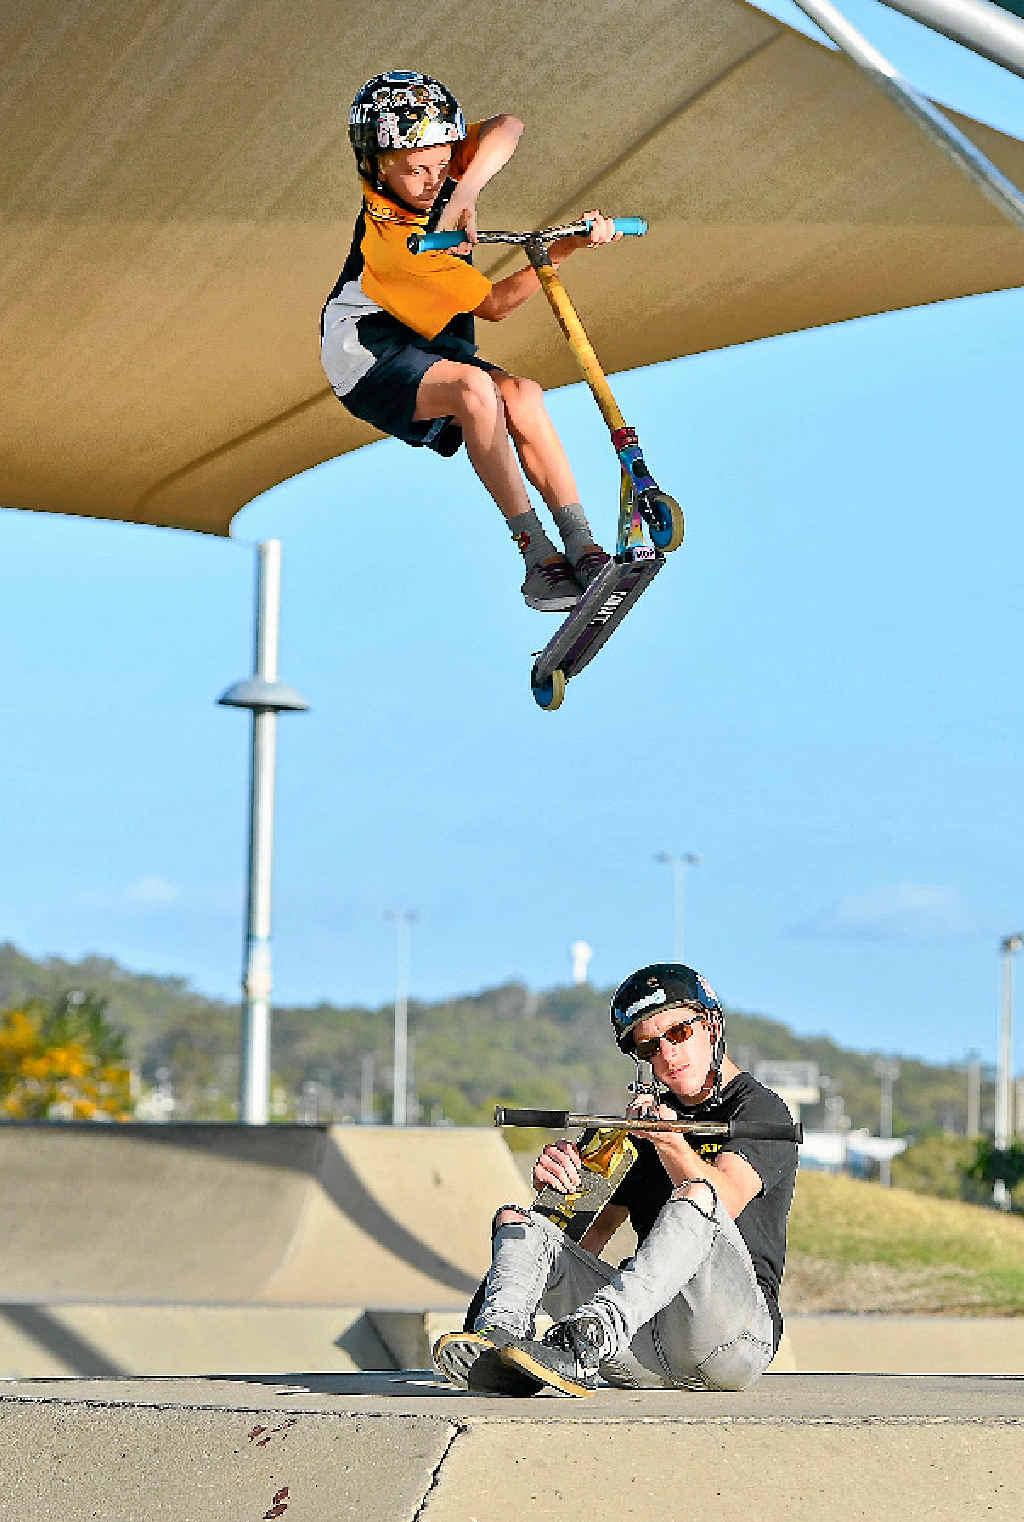 Darcy Davidson, 12, and Ben Davidson at the Gladstone skate park.